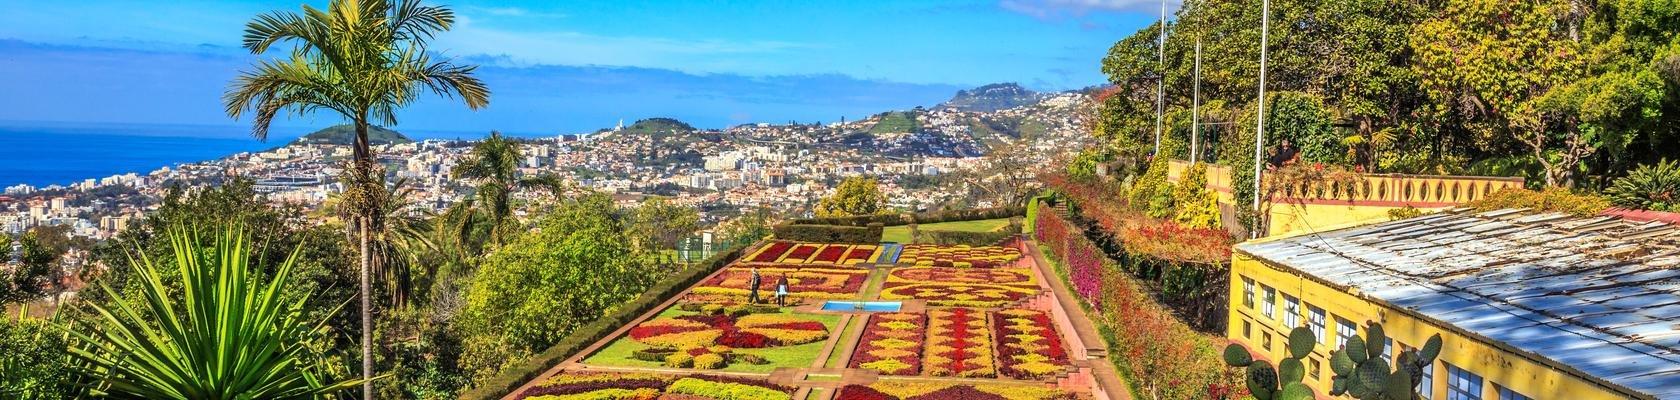 Funchal & de kleurrijke Madeira Botanical Gardens